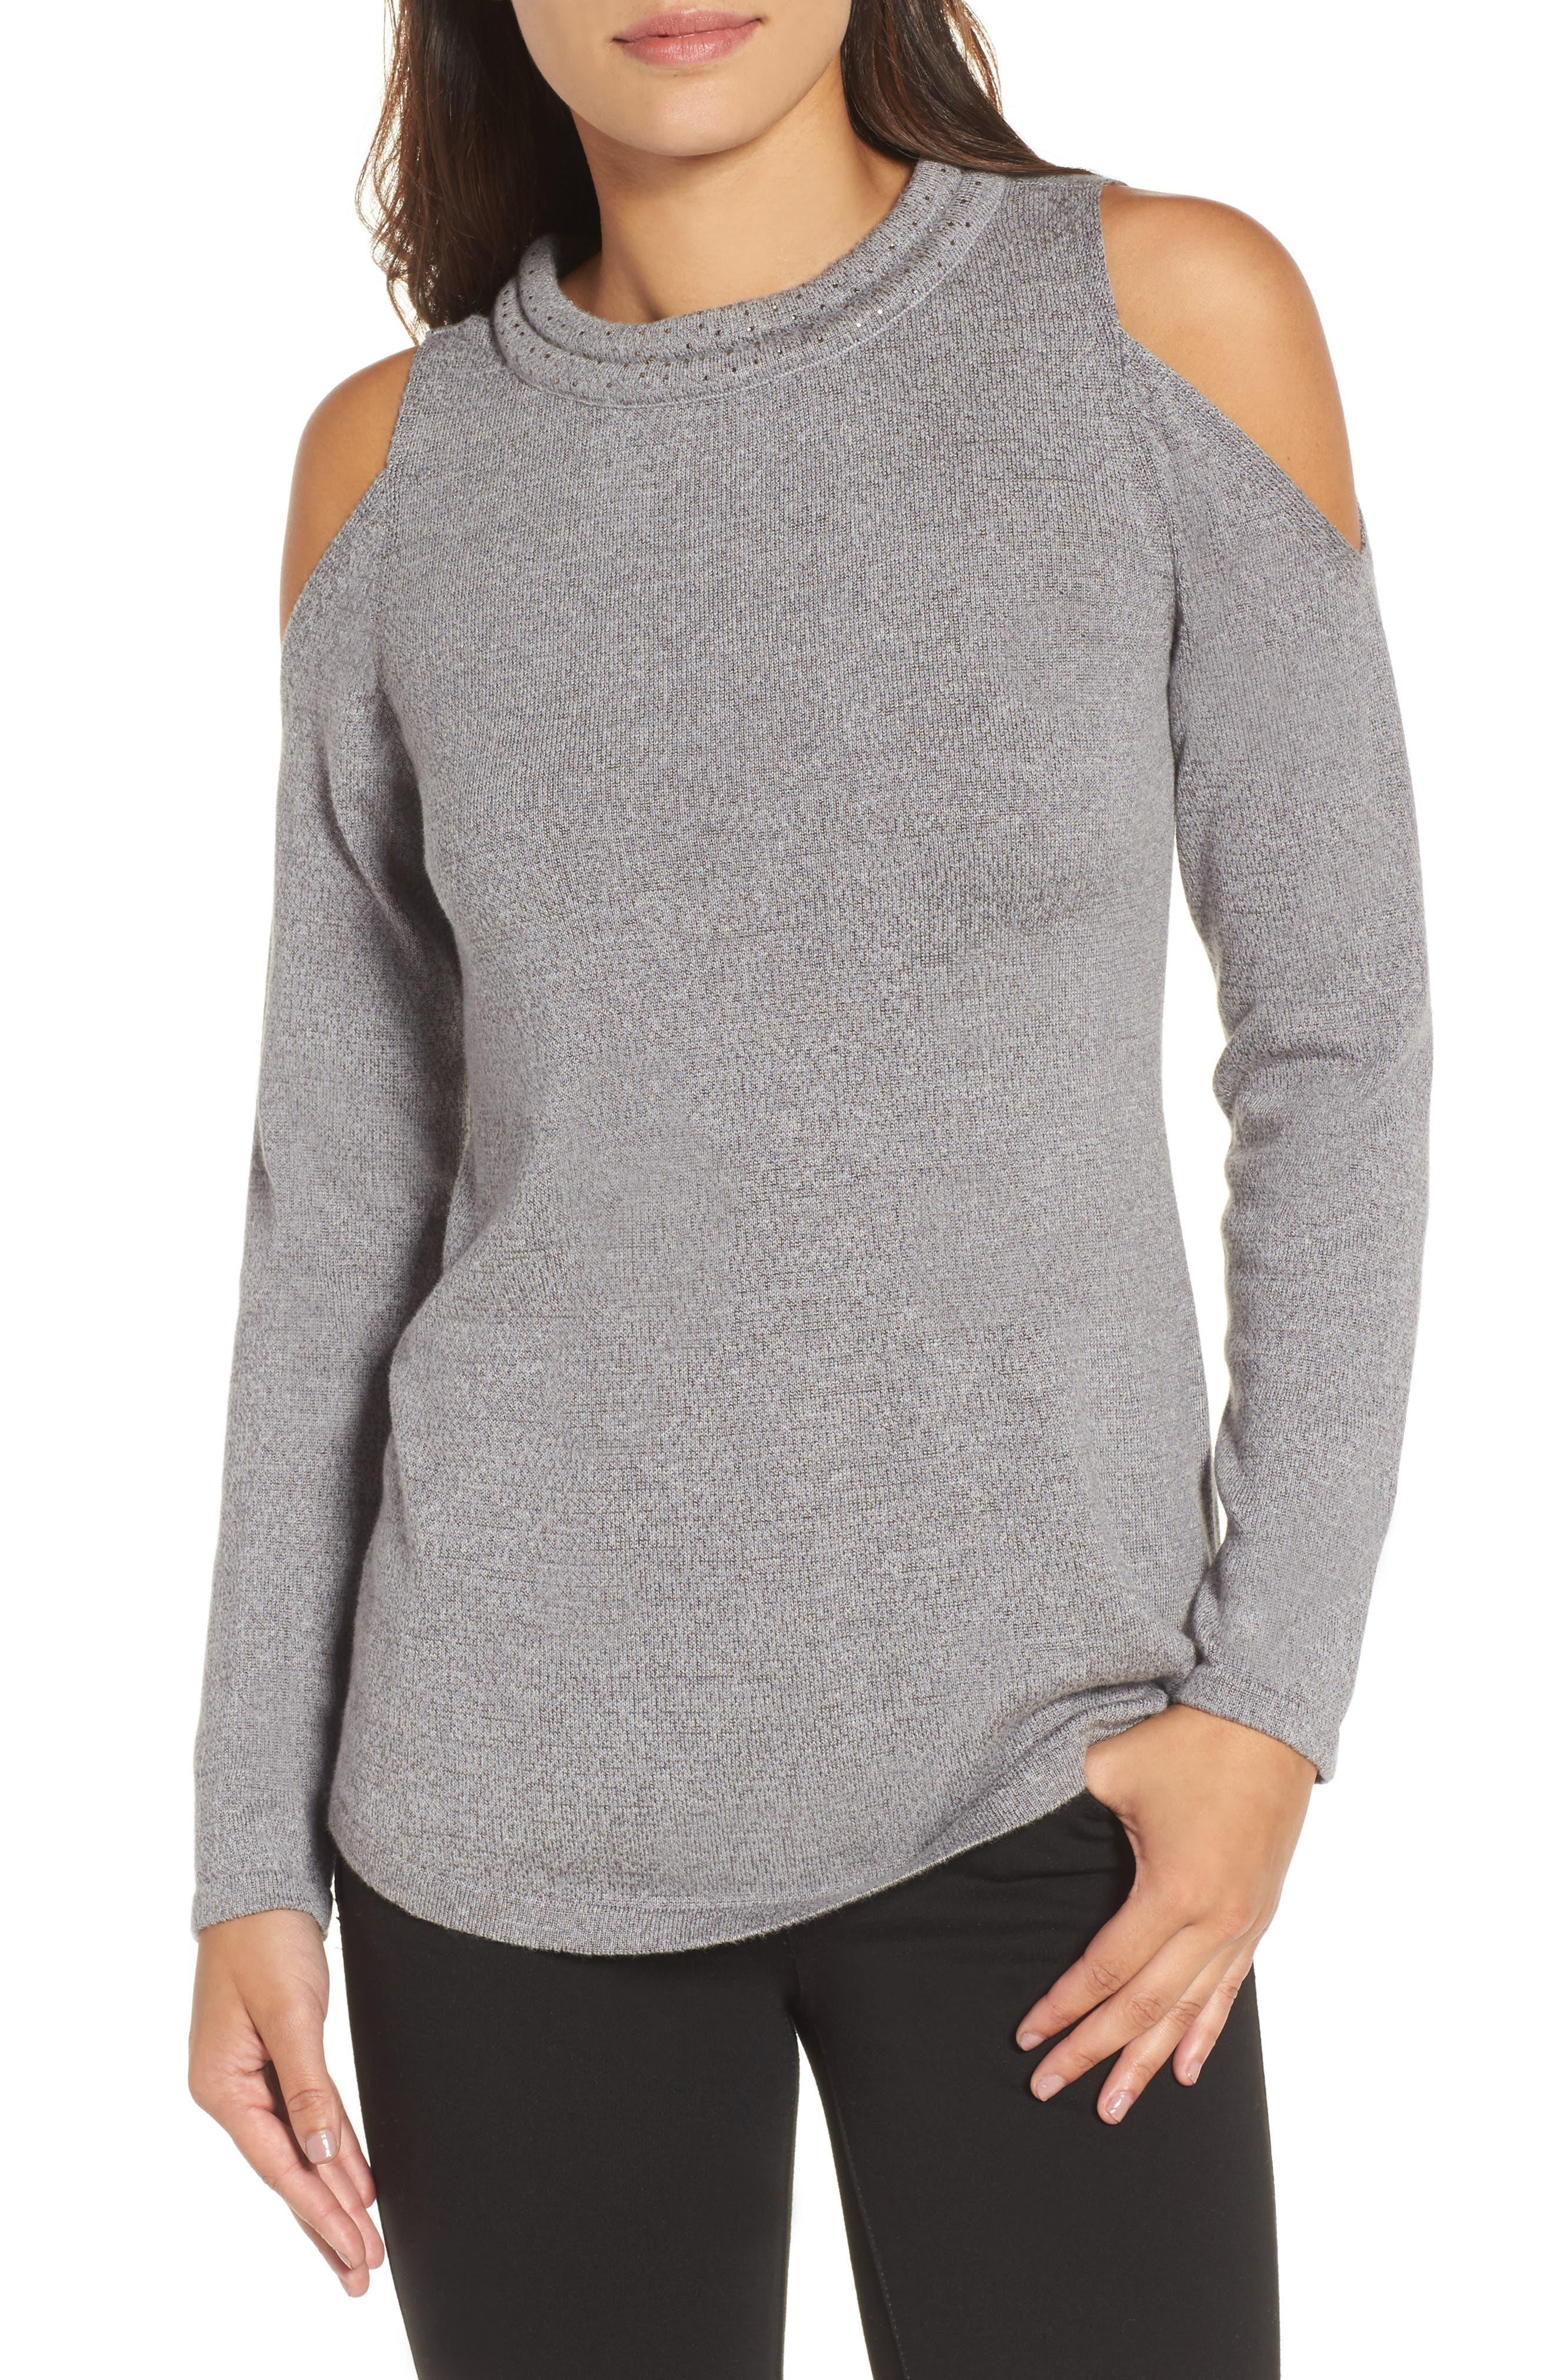 Main Image - NIC+ZOE Jewel Neck Cold Shoulder Top (Regular & Petite)